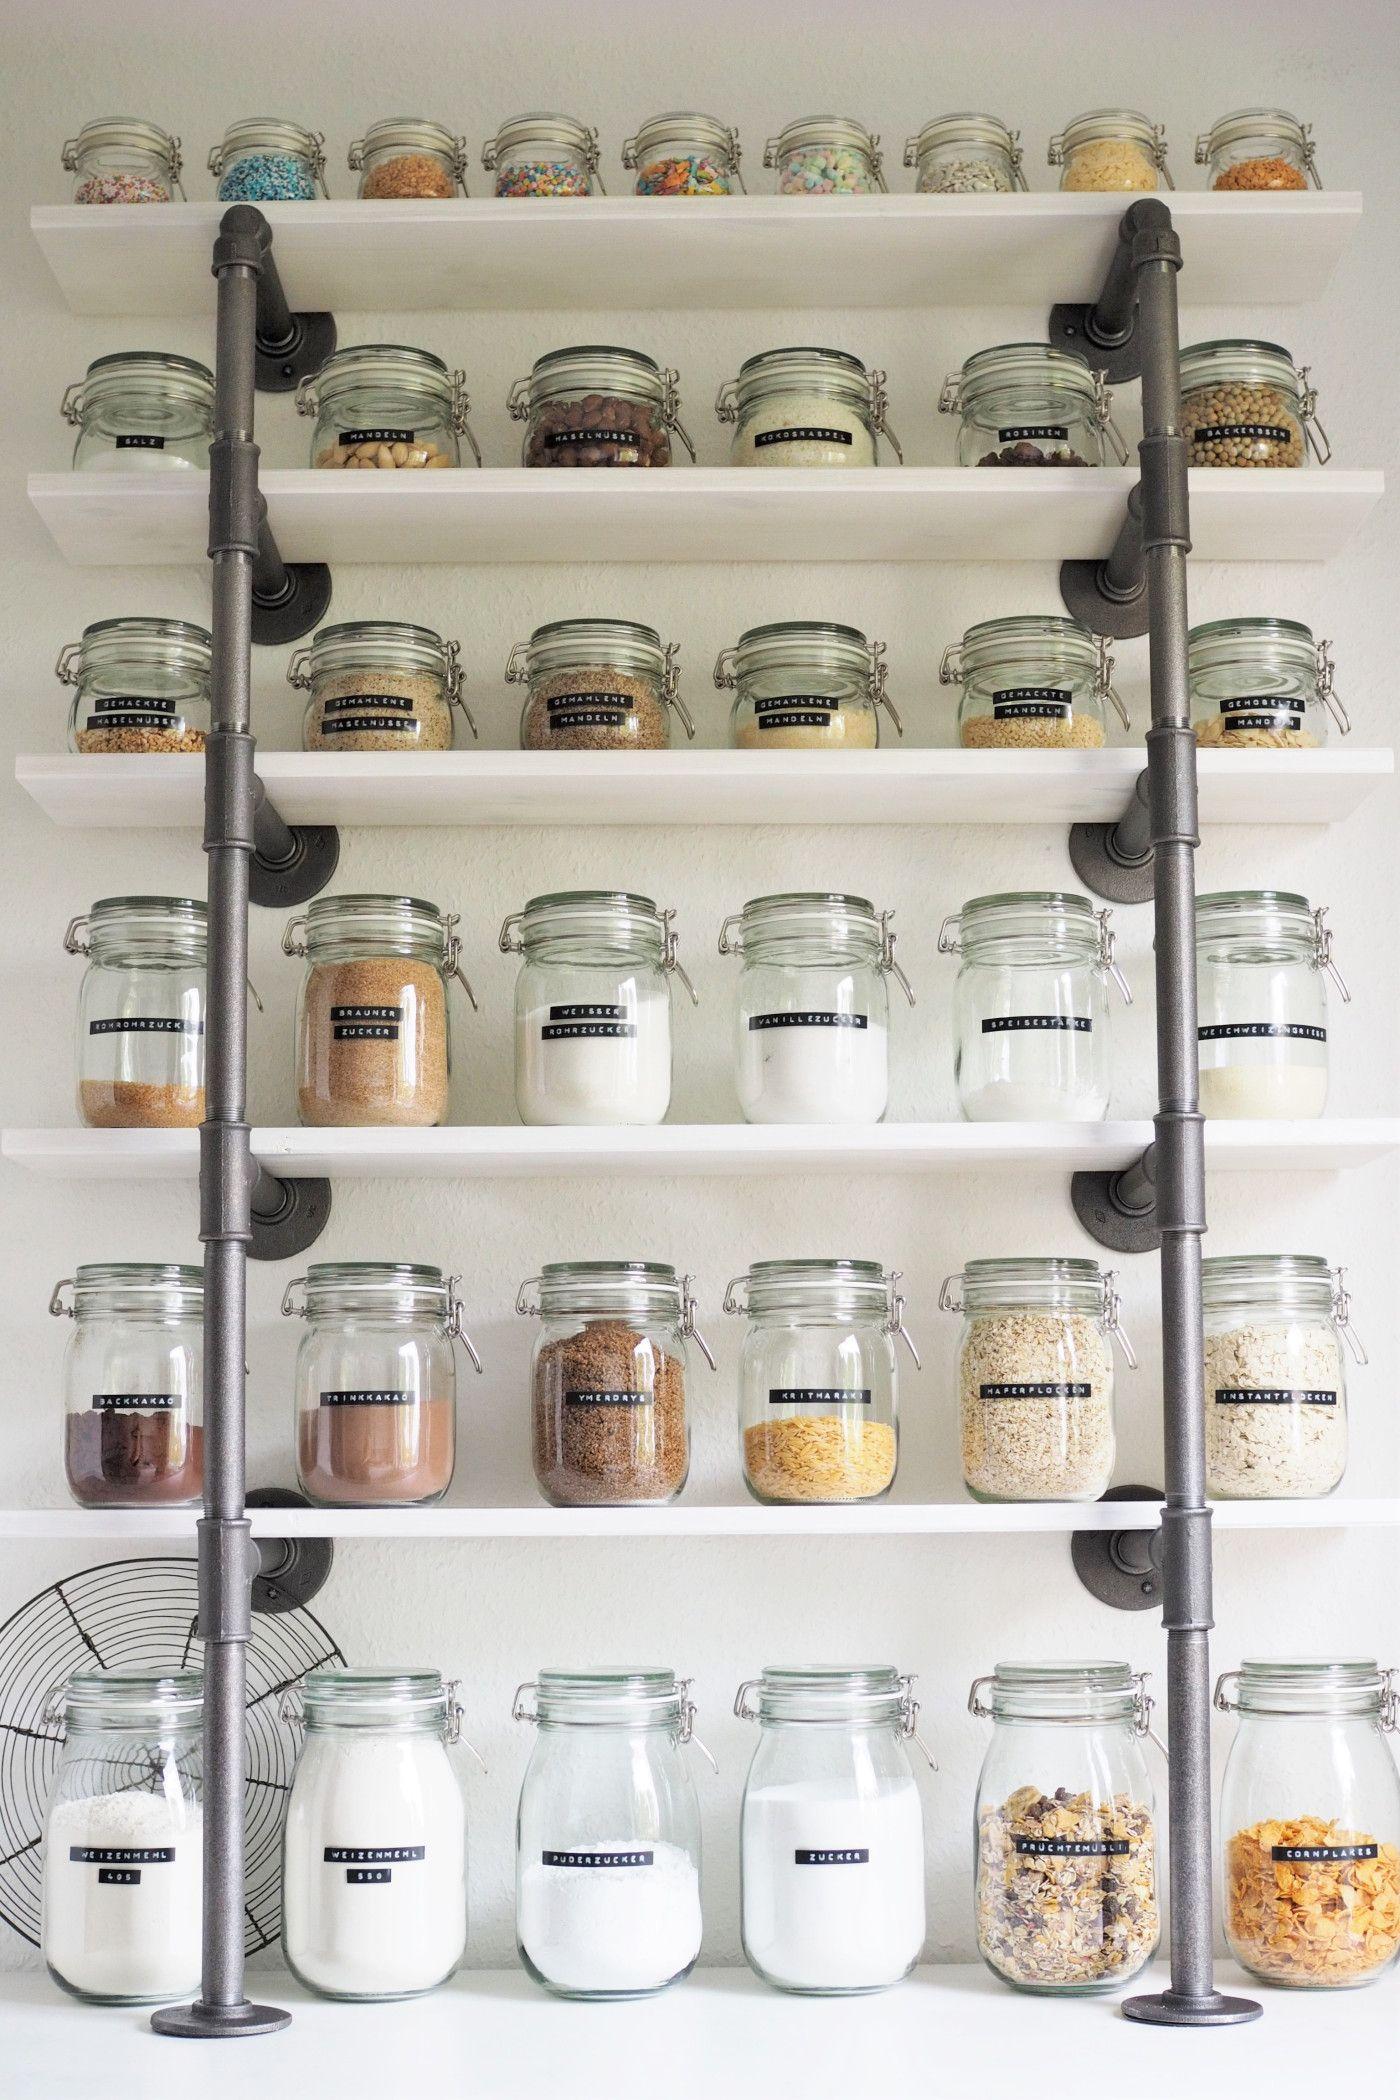 Atemberaubend Küche Lagerung Ikea Hacker Fotos - Küchenschrank Ideen ...